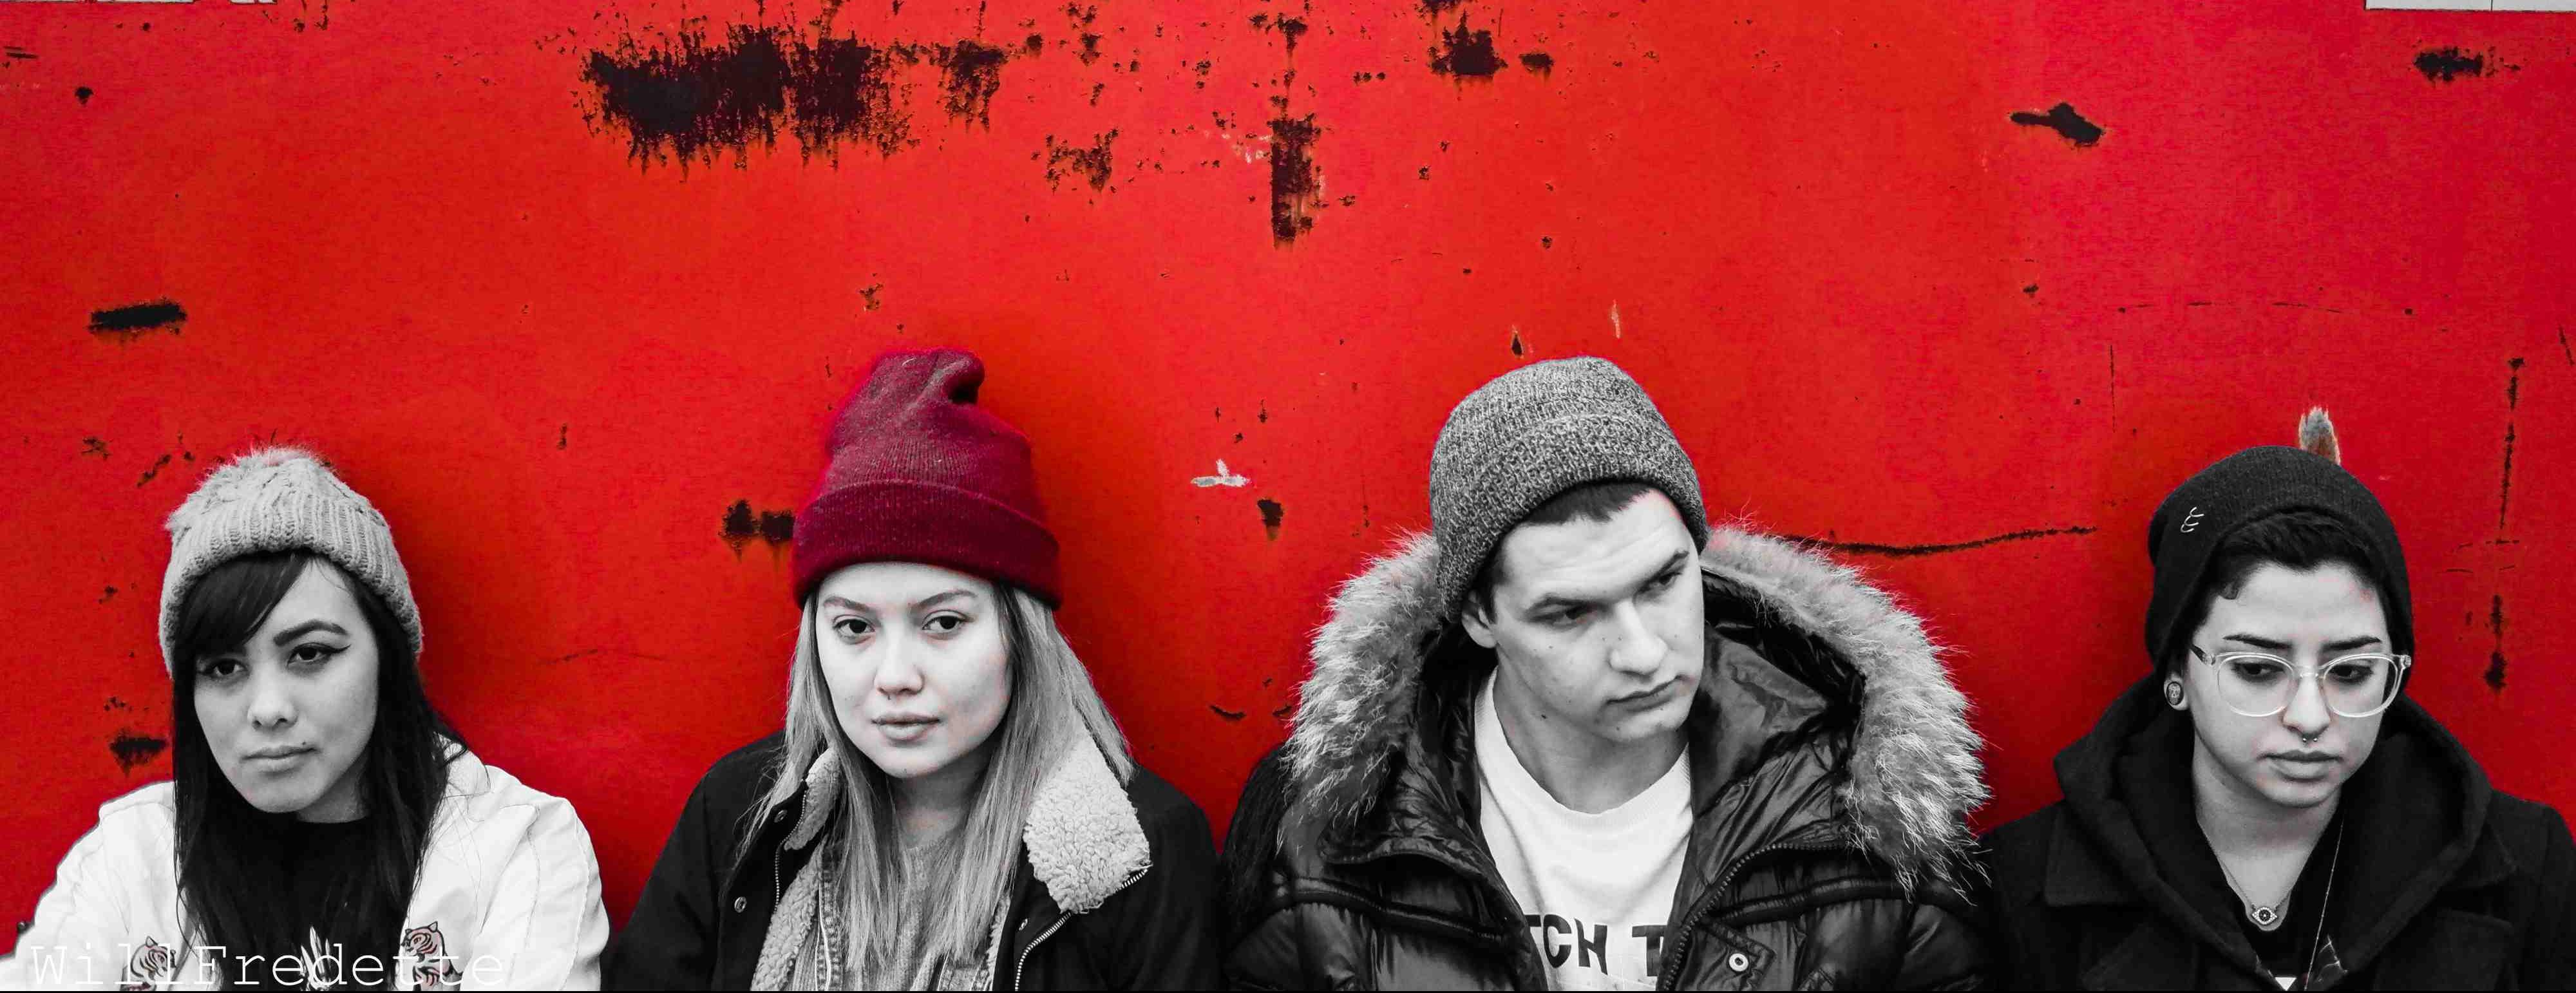 Caribbean Crisis Drops New Album Mixing Punk and Russian Folk